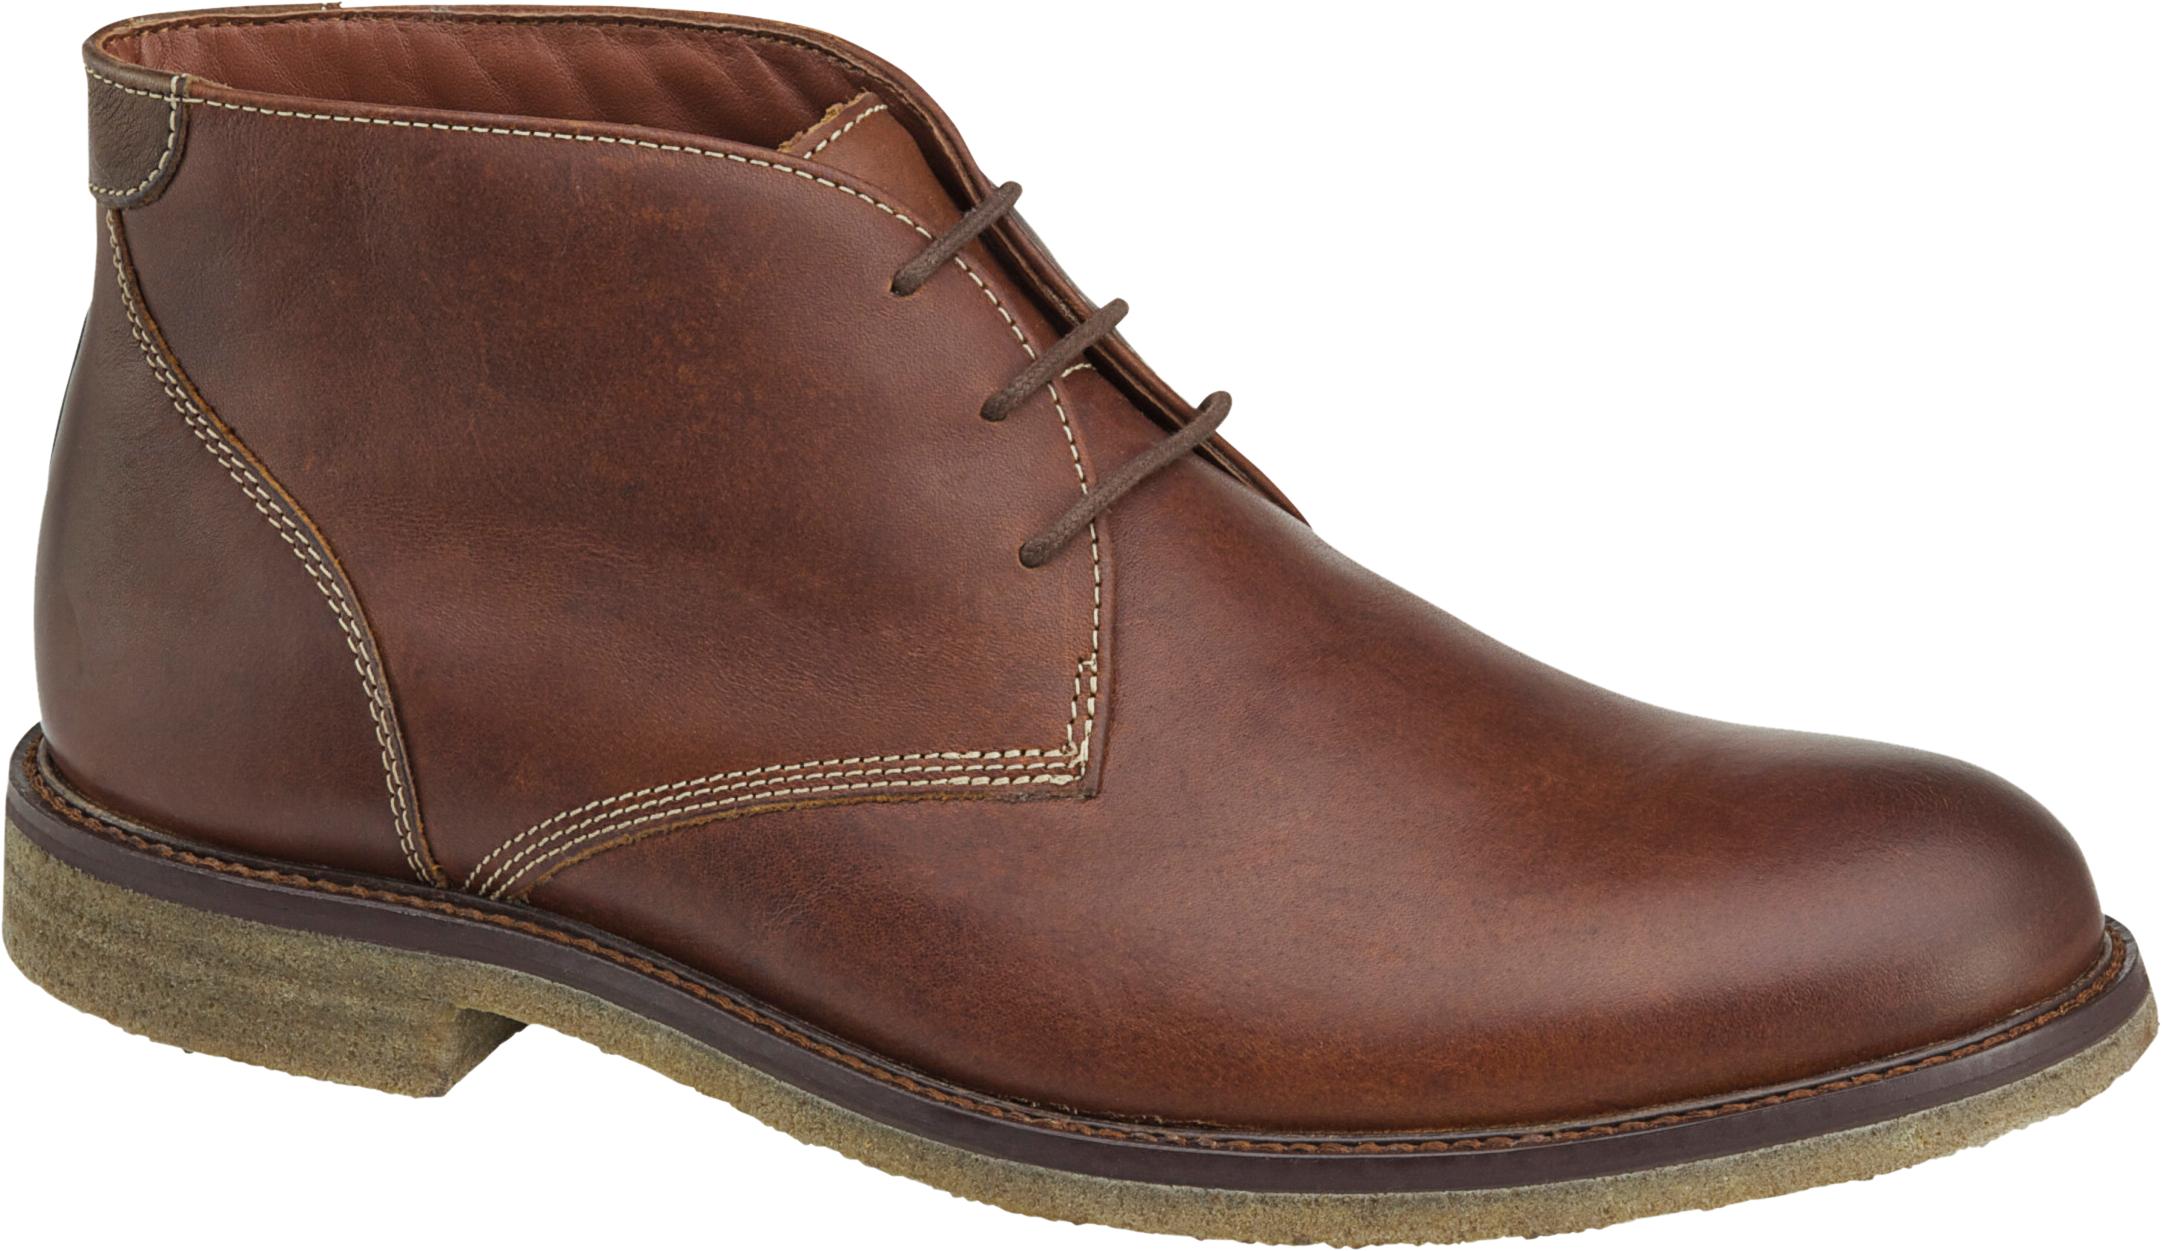 b6ec04966ac Johnston   Murphy Copeland Chukka Boots - Johnston   Murphy